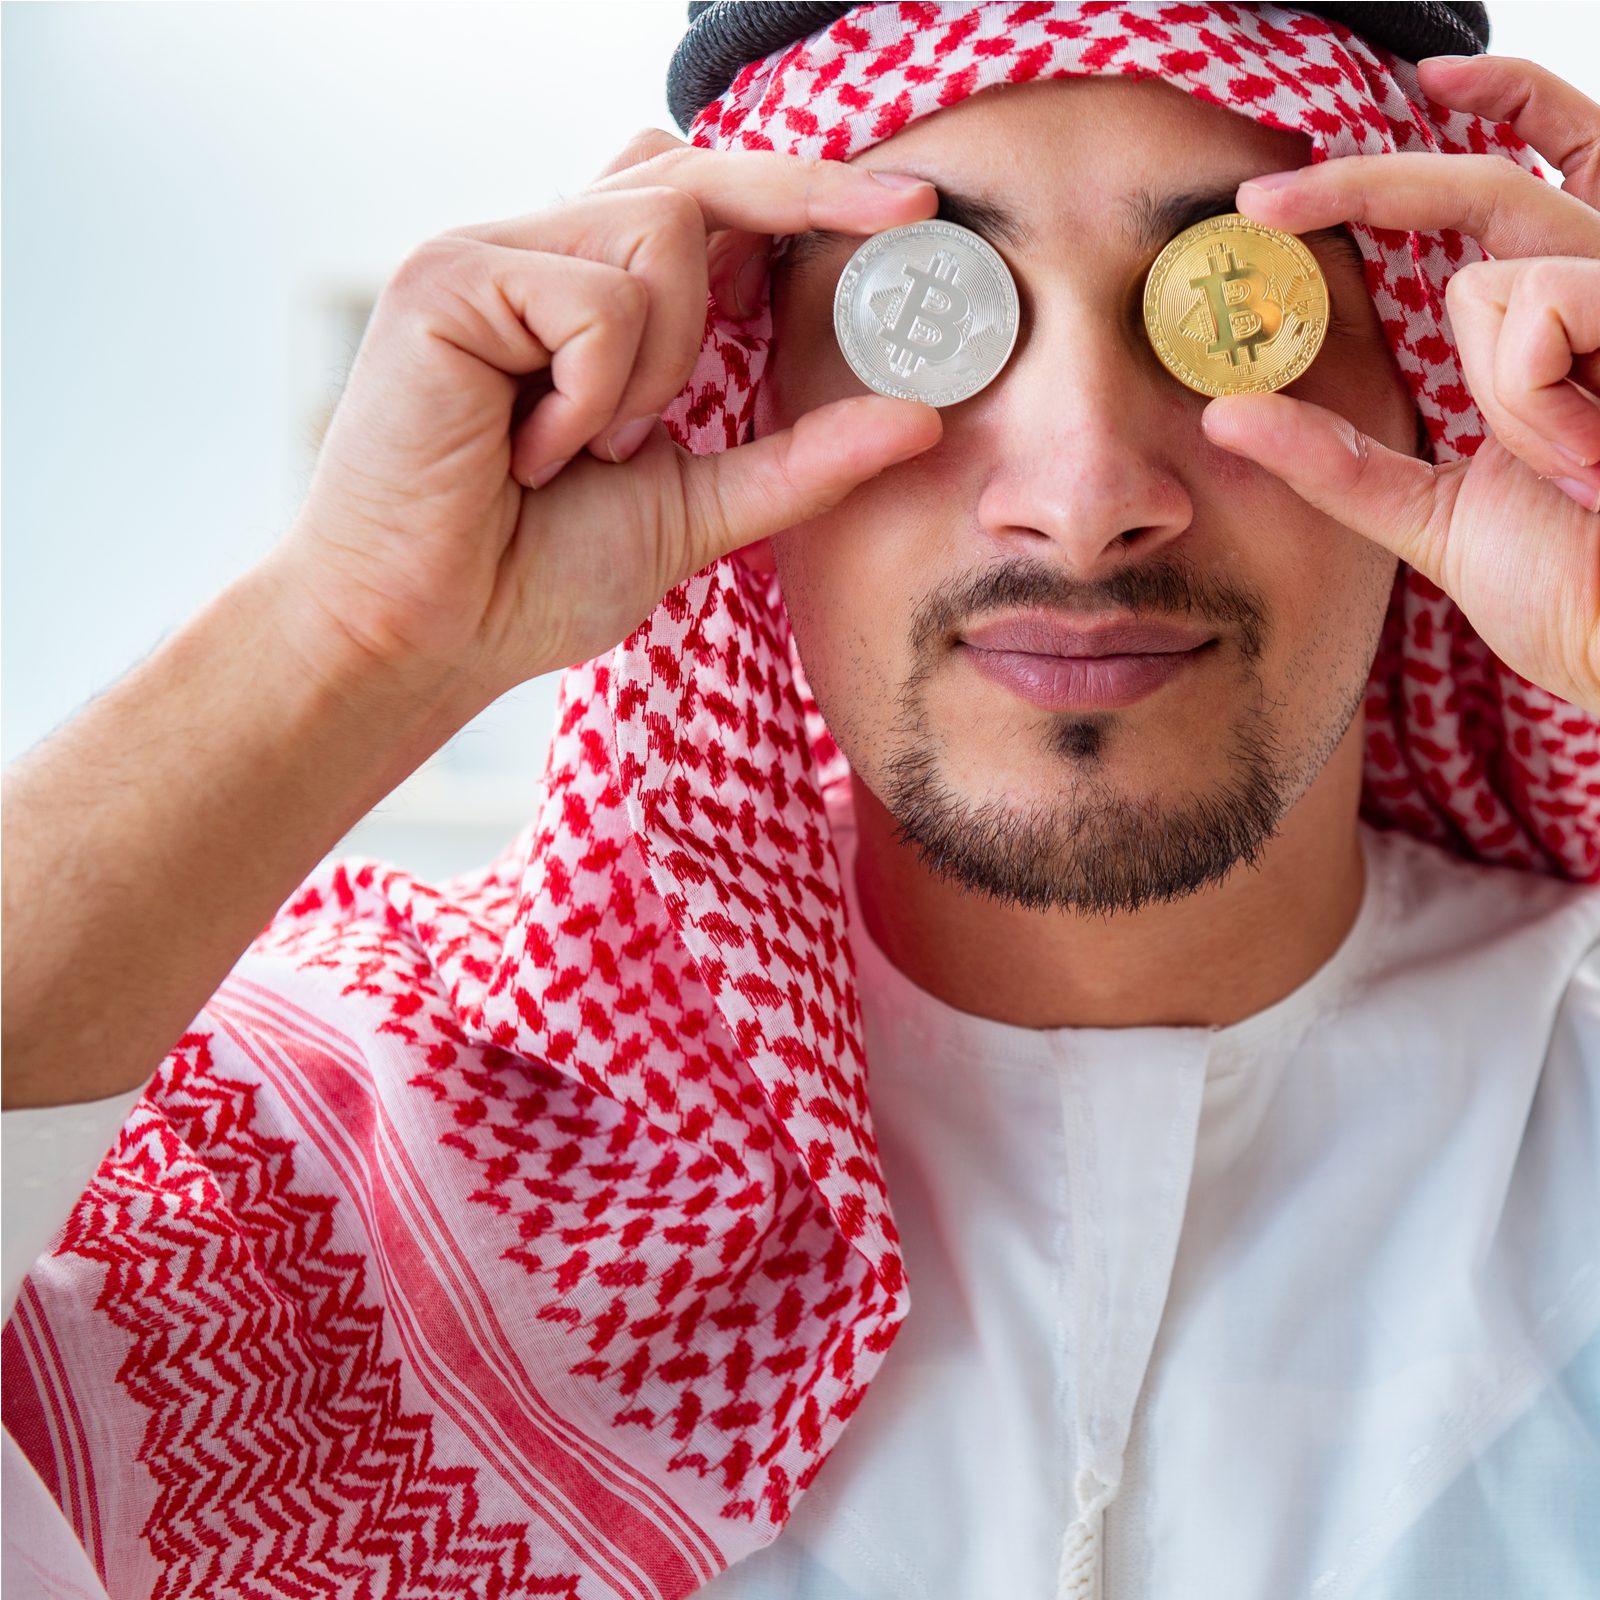 This Week in Bitcoin: Islamic Exchange, Self-Regulation, Social Trading